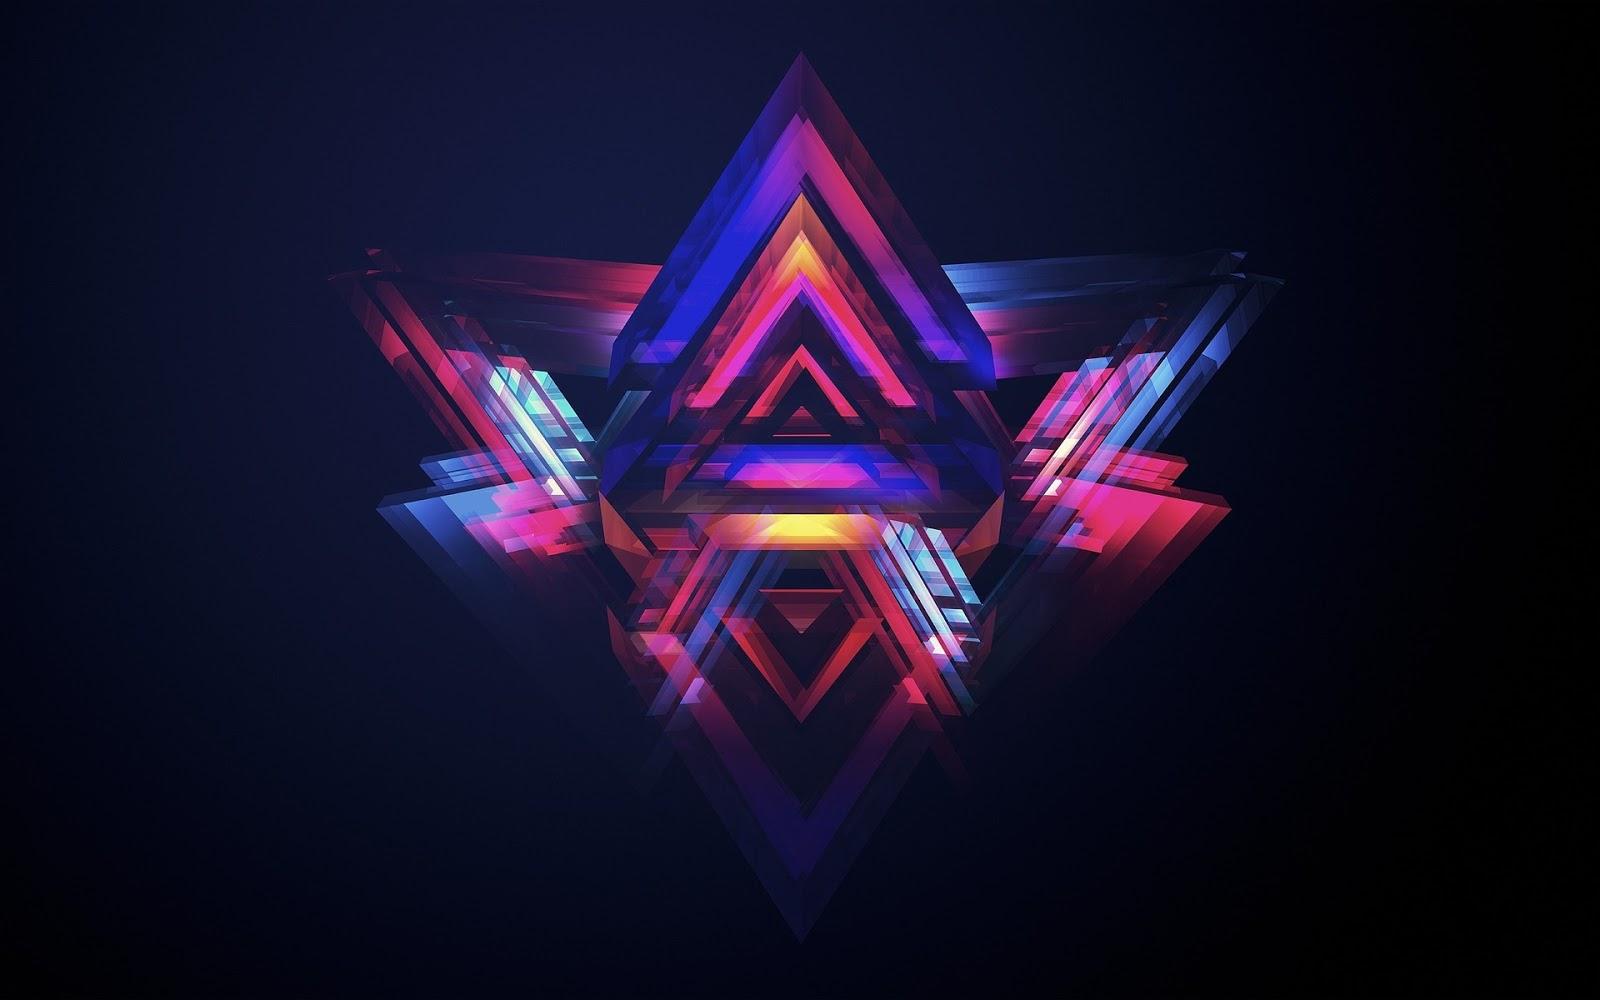 Neon HD Wallpaper Free Download - Neon Pyramids